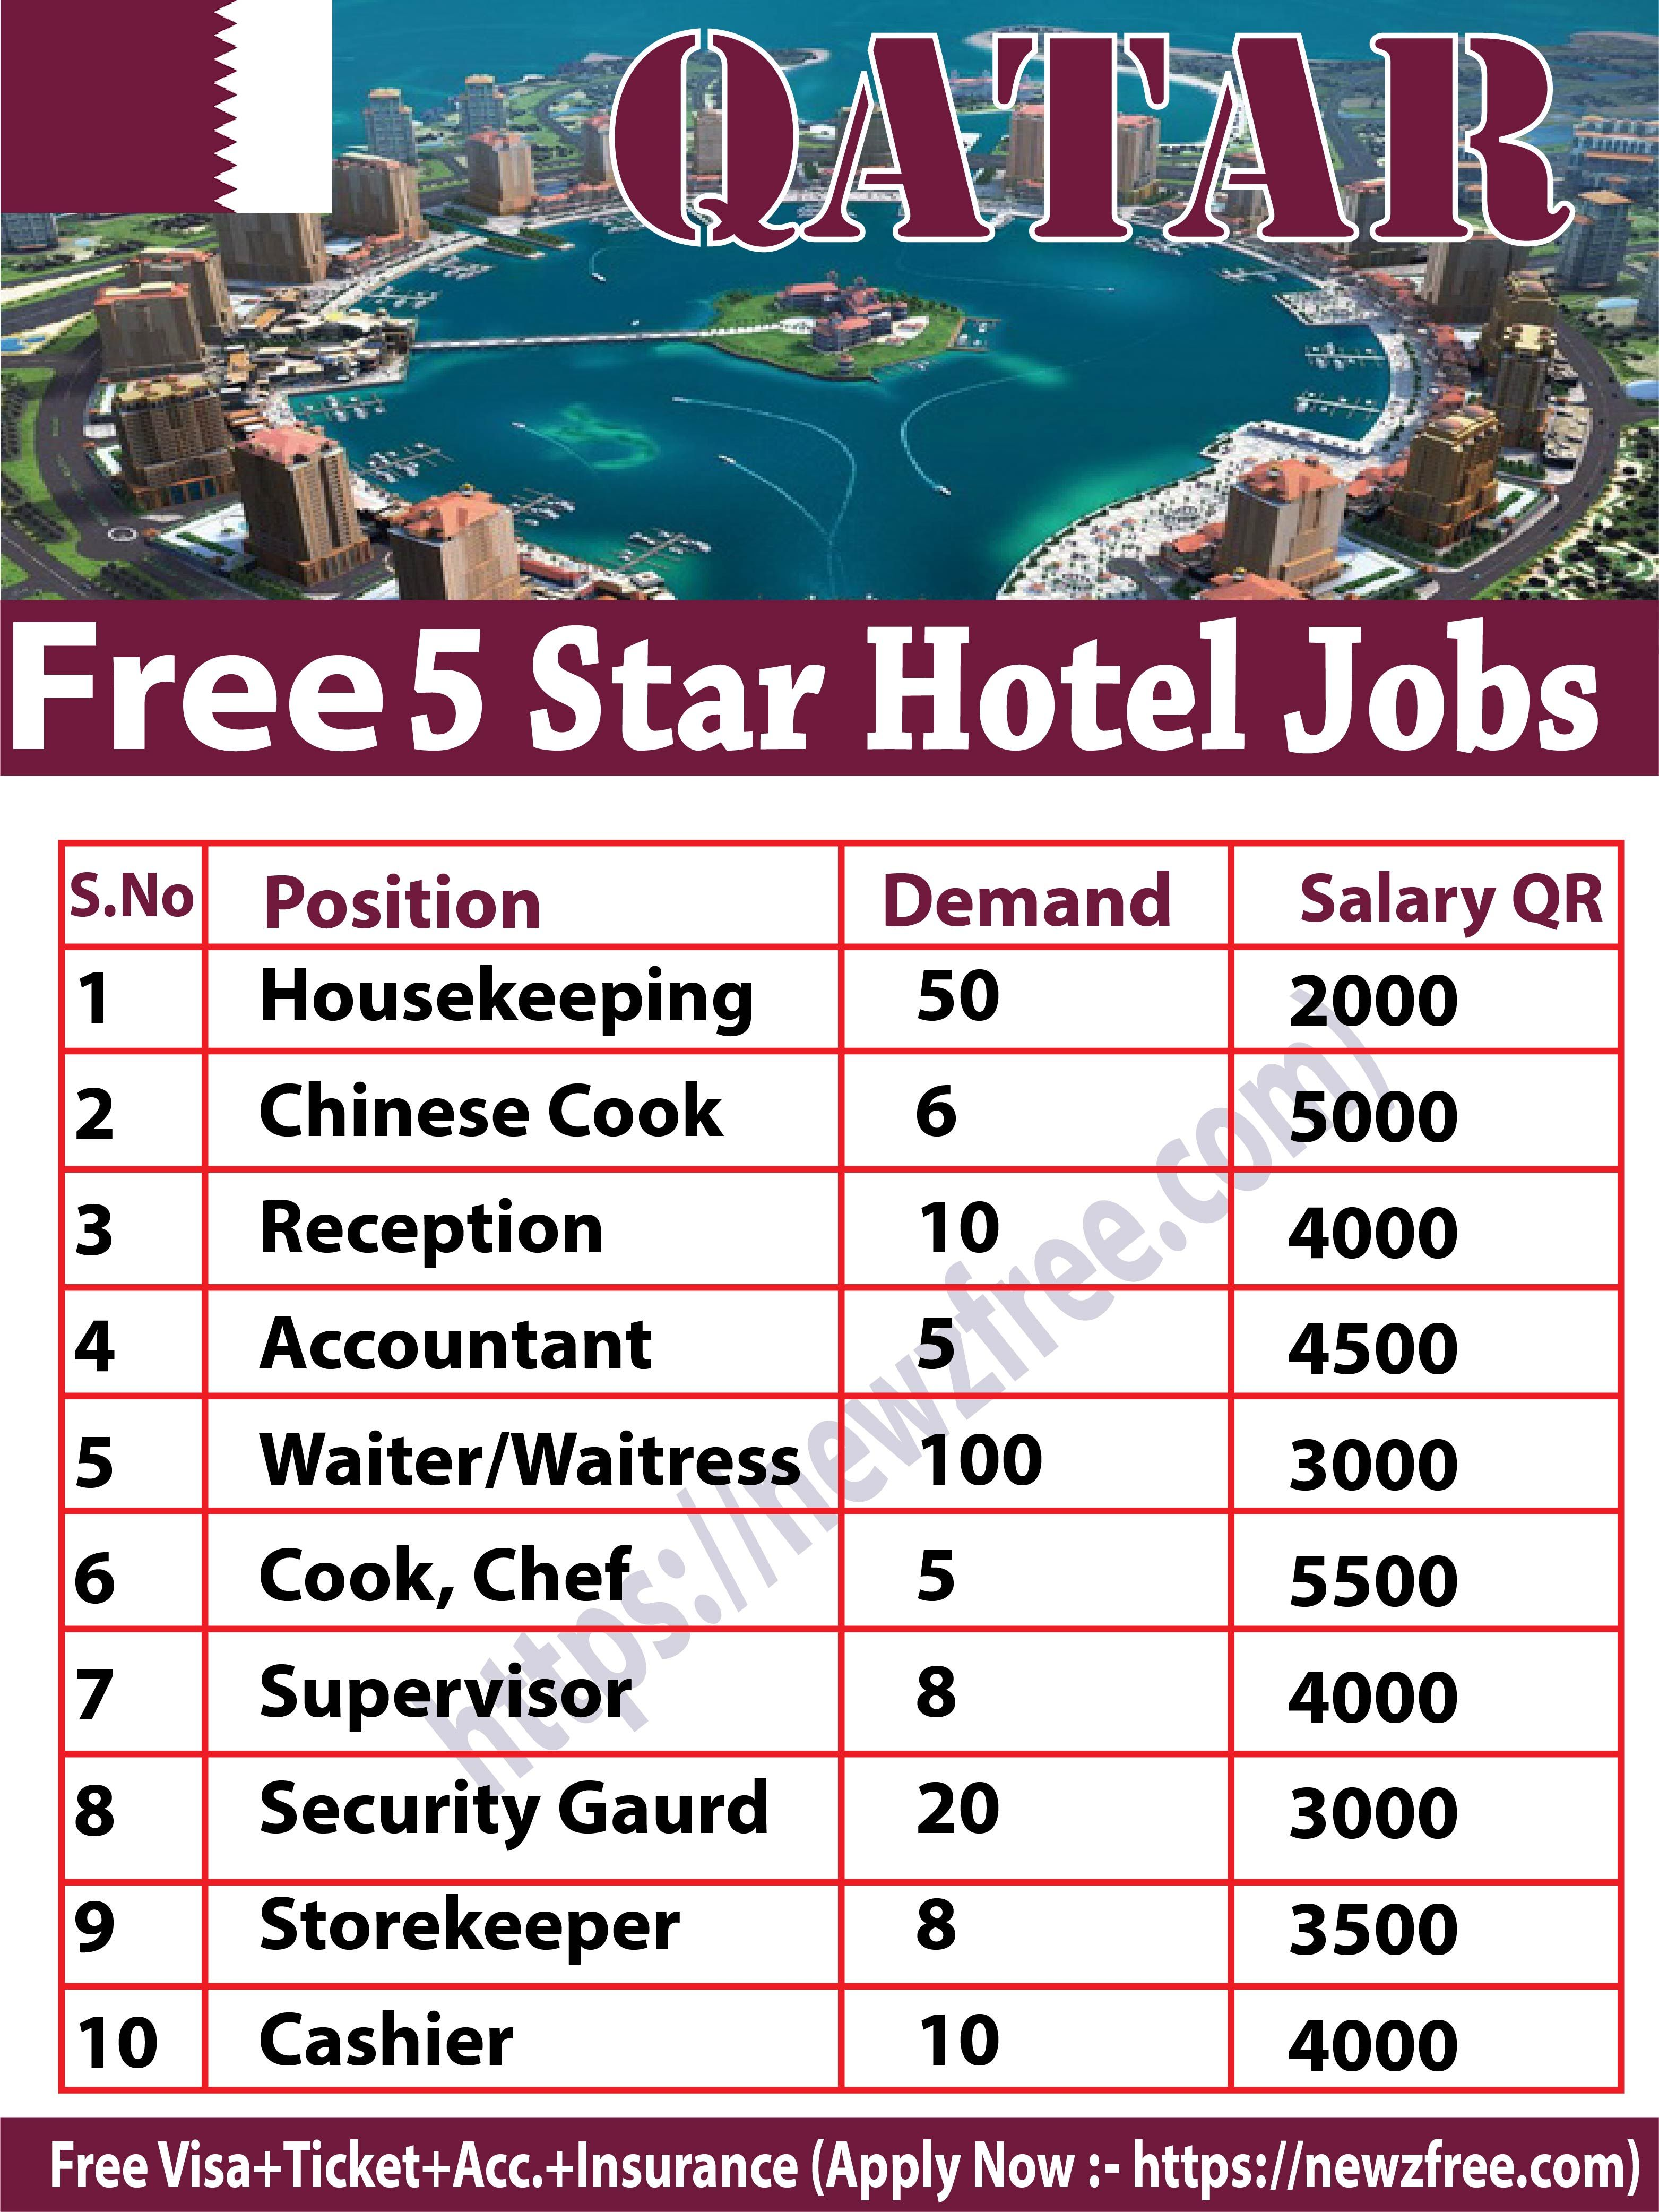 100 Free 5 Star Hotel Jobs In Doha Qatar All Nationality